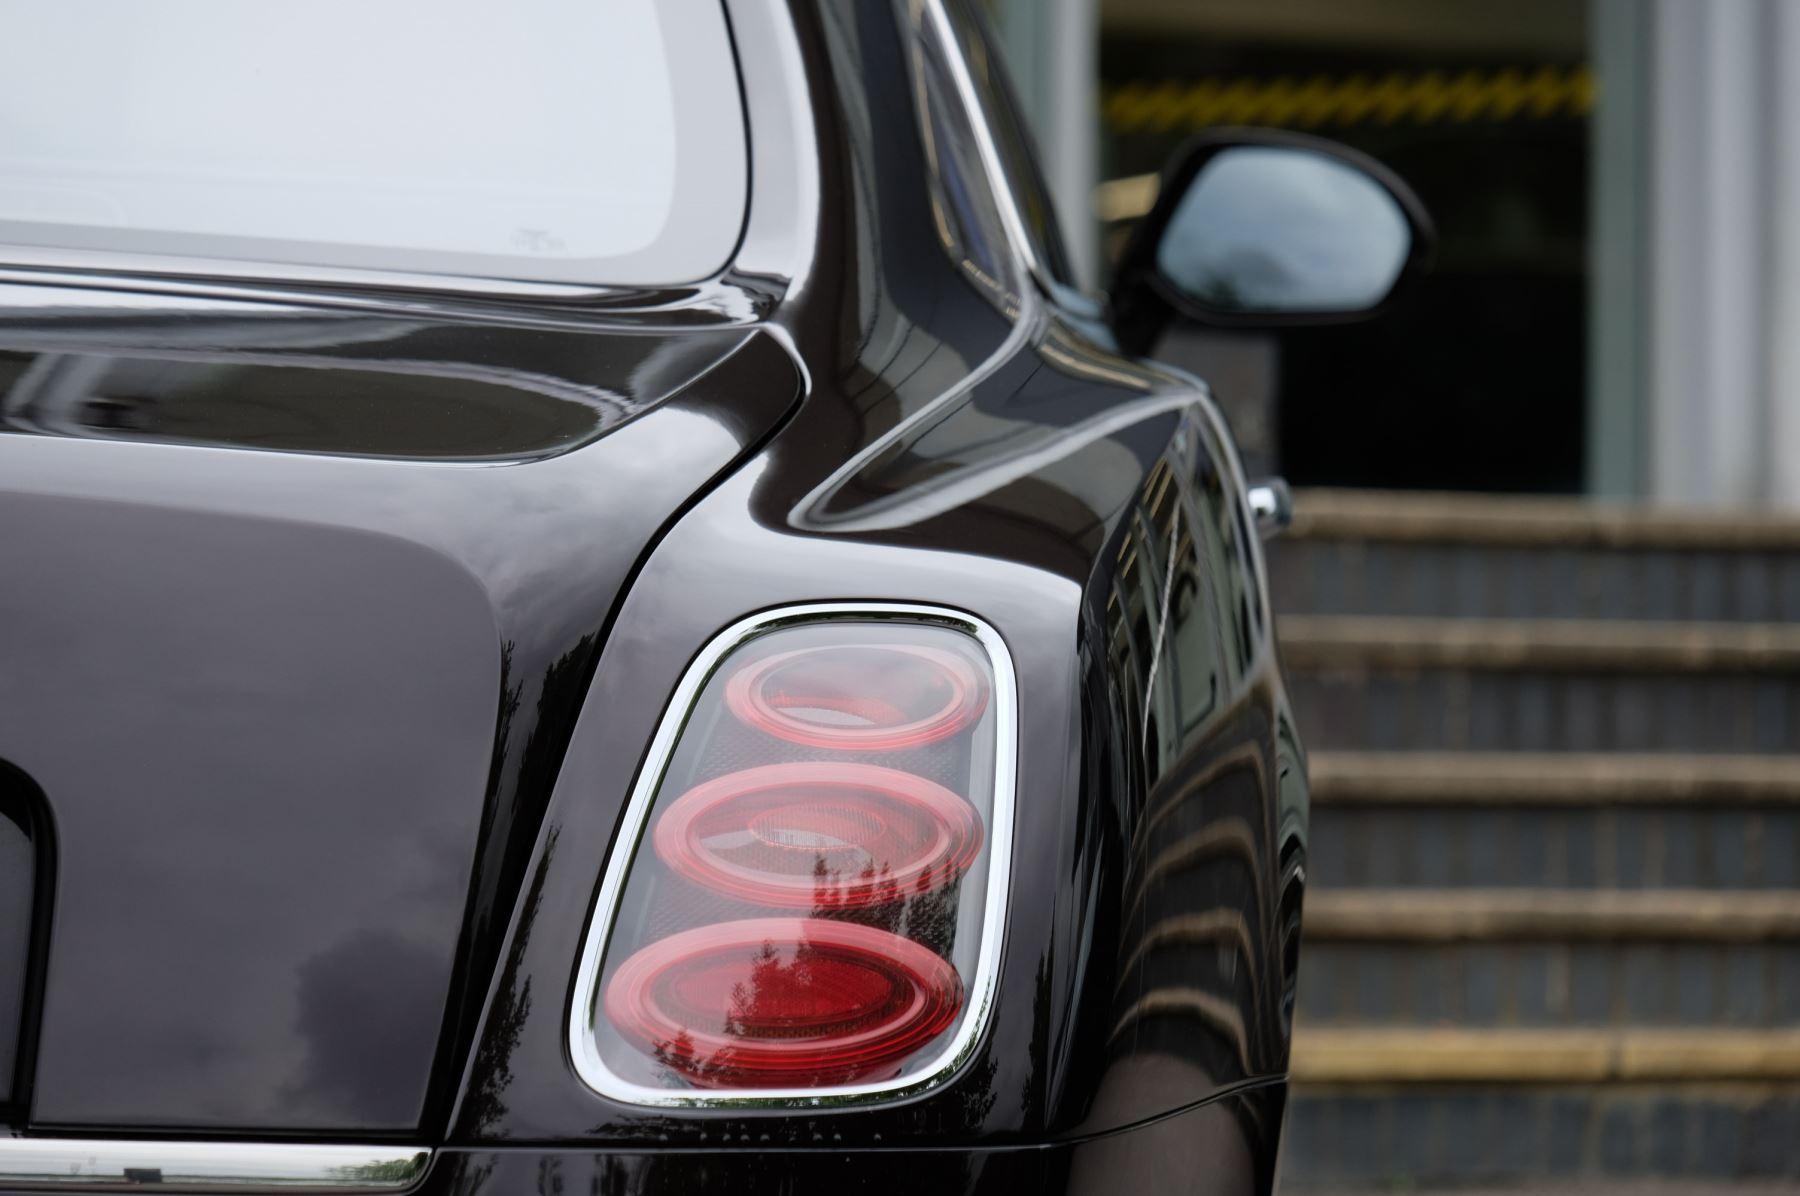 Bentley Mulsanne 6.8 V8 Speed - Speed Premier Specification image 8